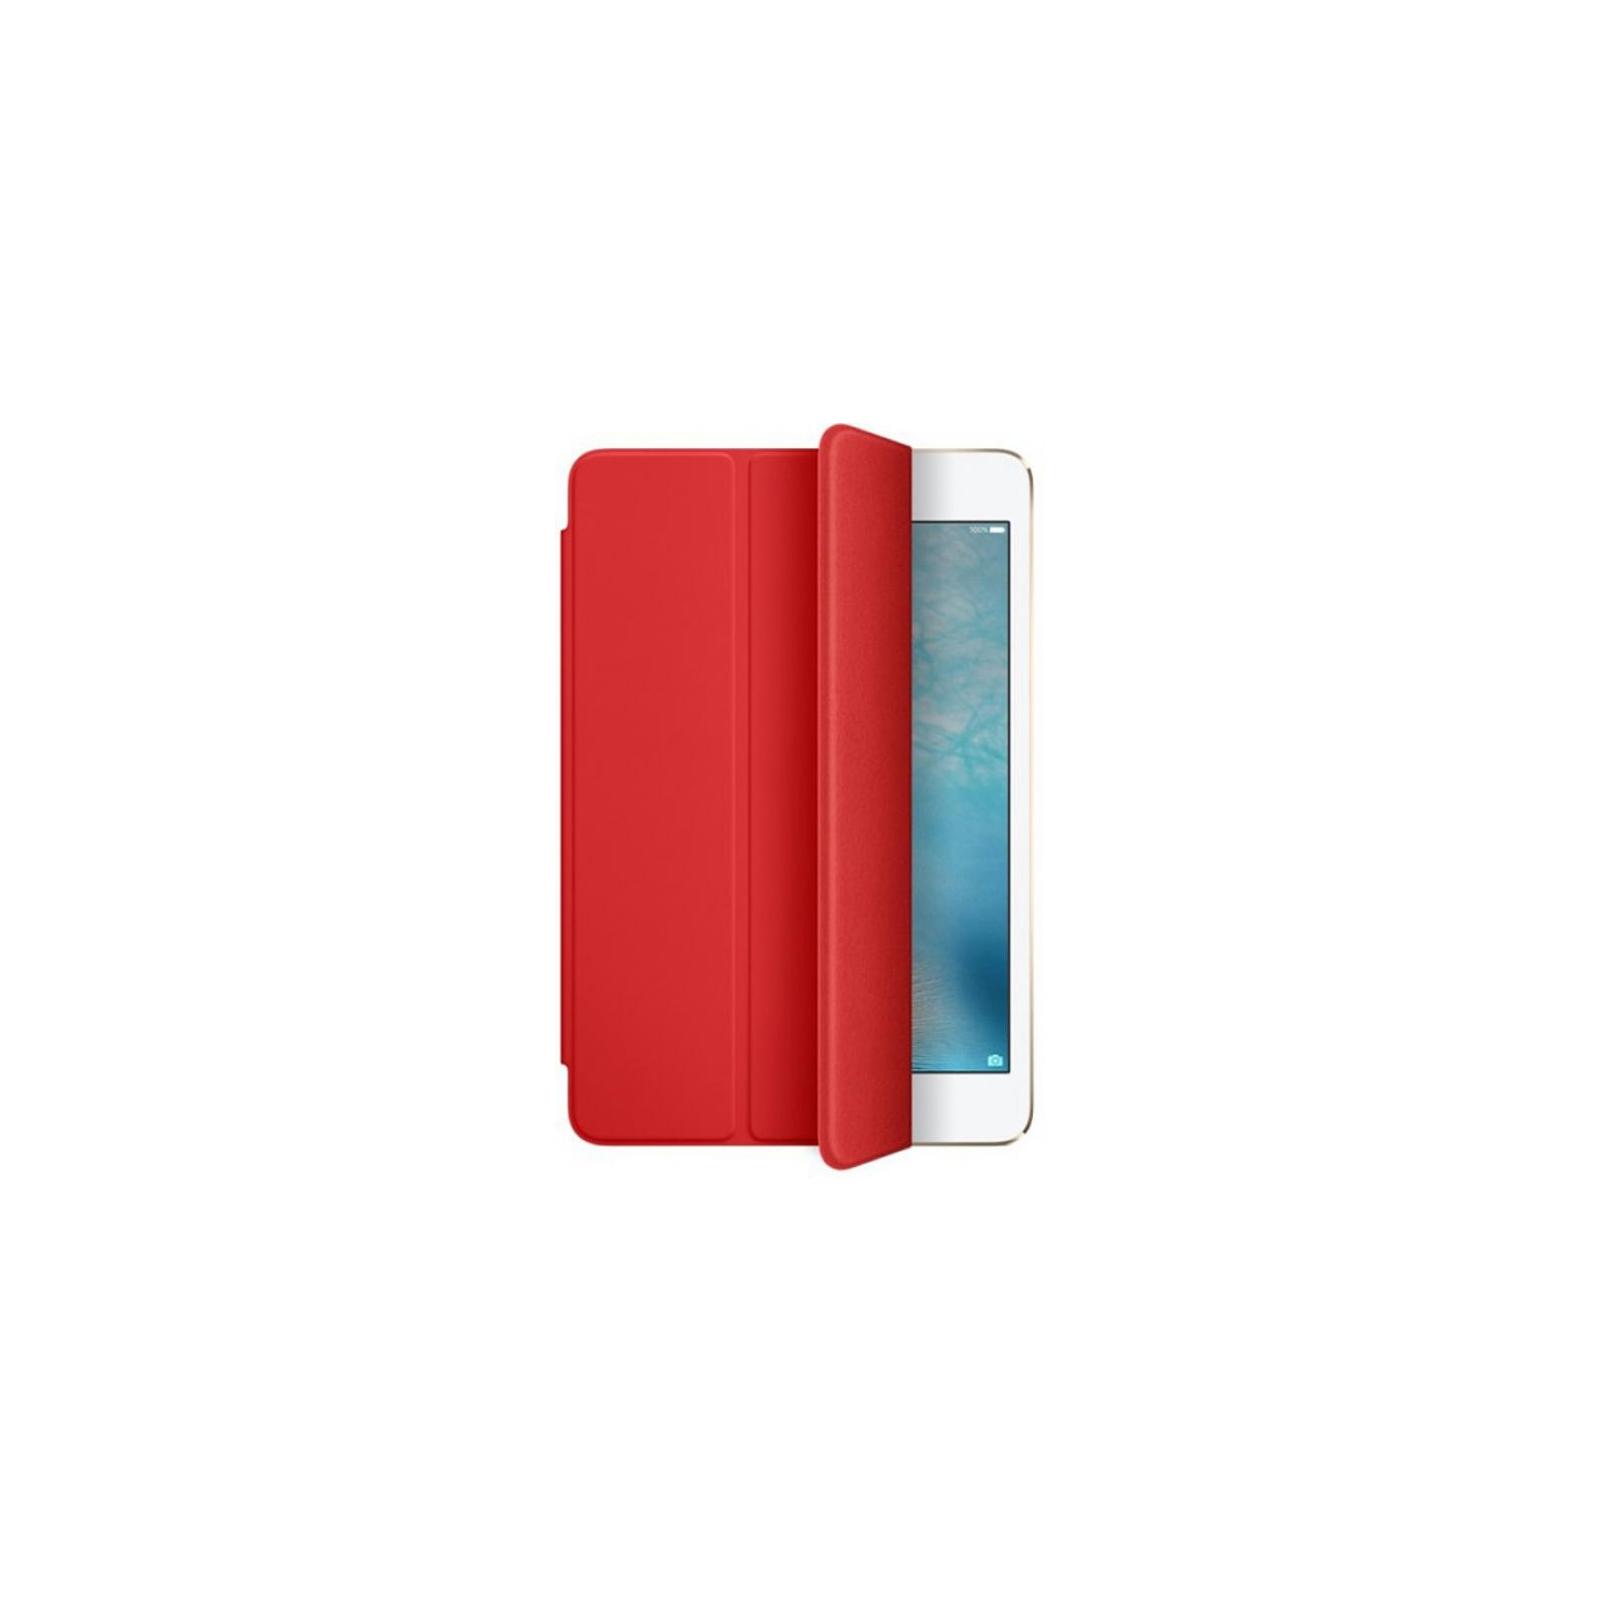 Чехол для планшета Apple Smart Cover для iPad mini 4 Red (MKLY2ZM/A) изображение 3